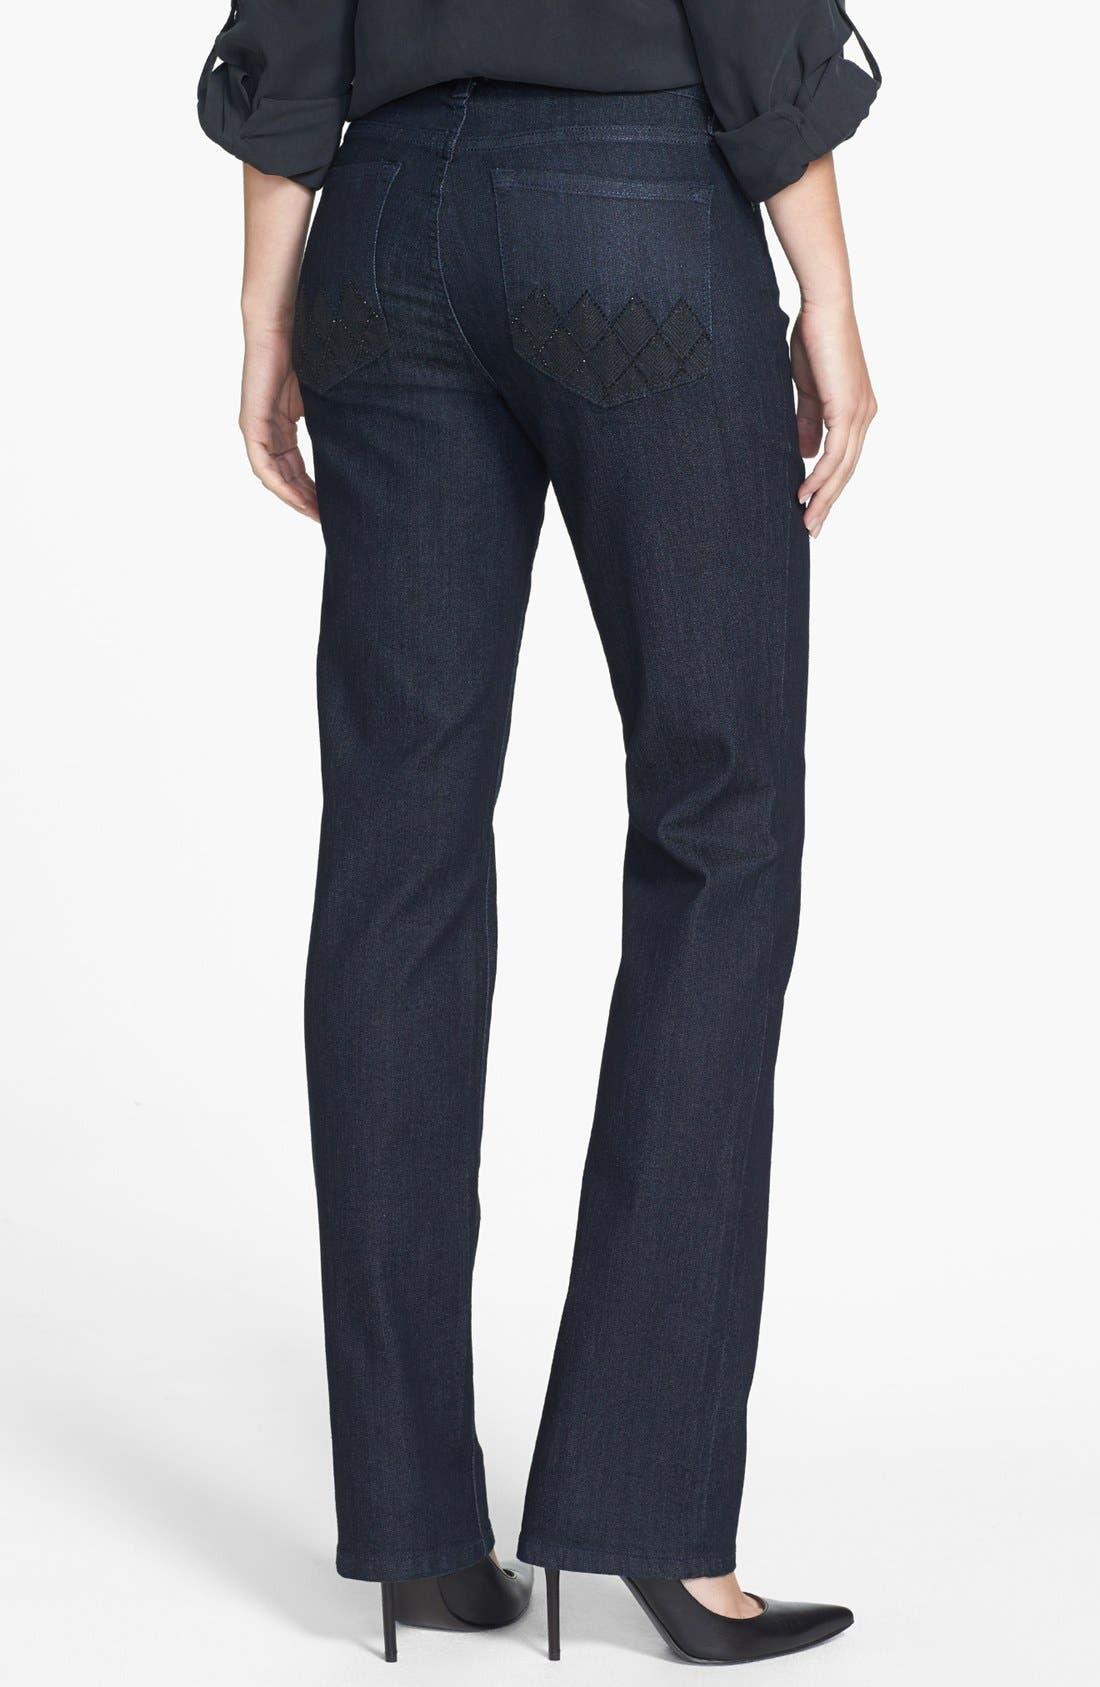 Alternate Image 3  - NYDJ 'Marilyn' Embellished Pocket Stretch Straight Leg Jeans